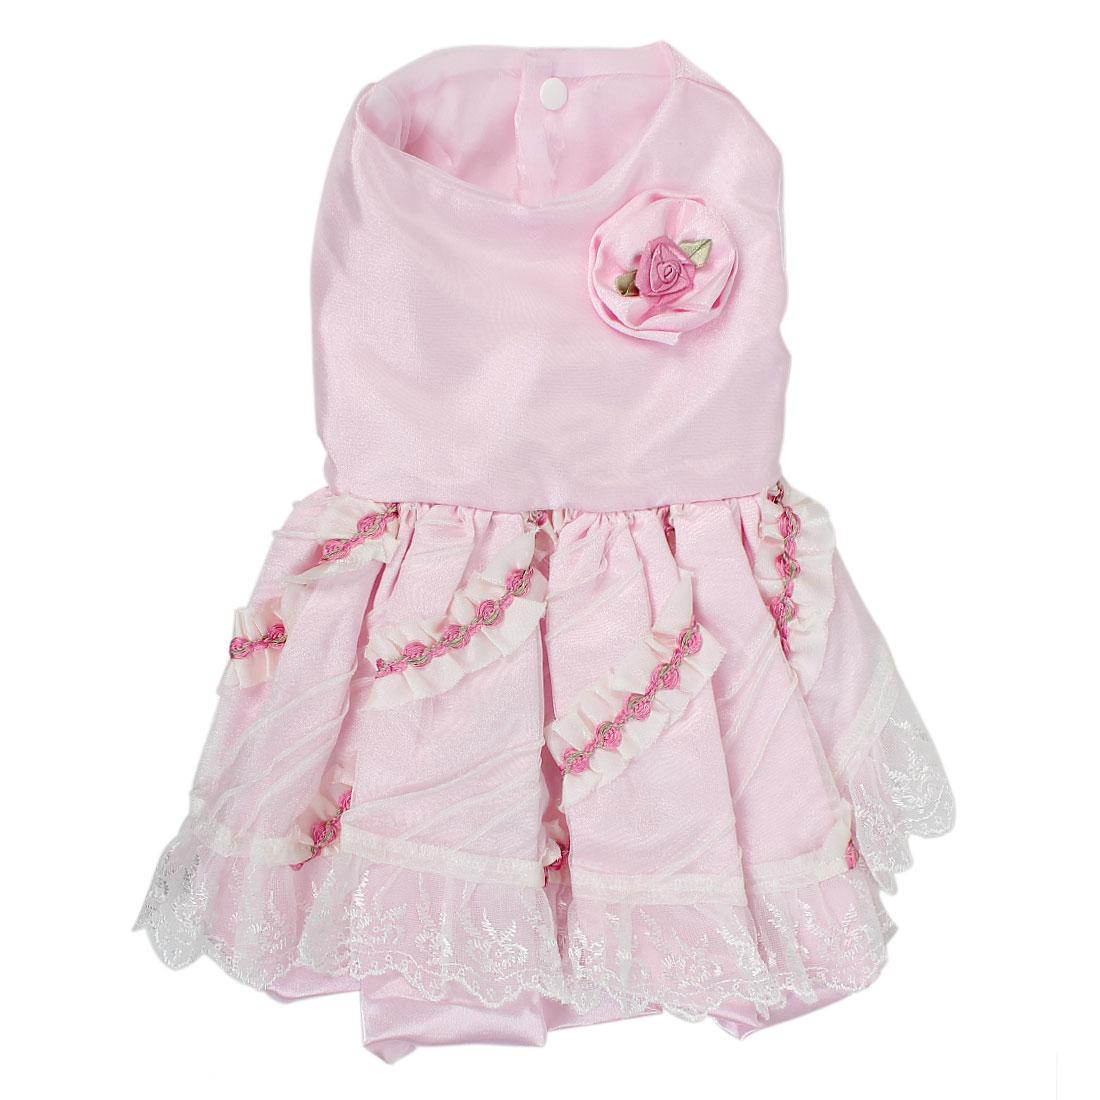 Pet Cat Doggie Rose Lace Decor Princess Wedding Dress Skirt Pink Size M